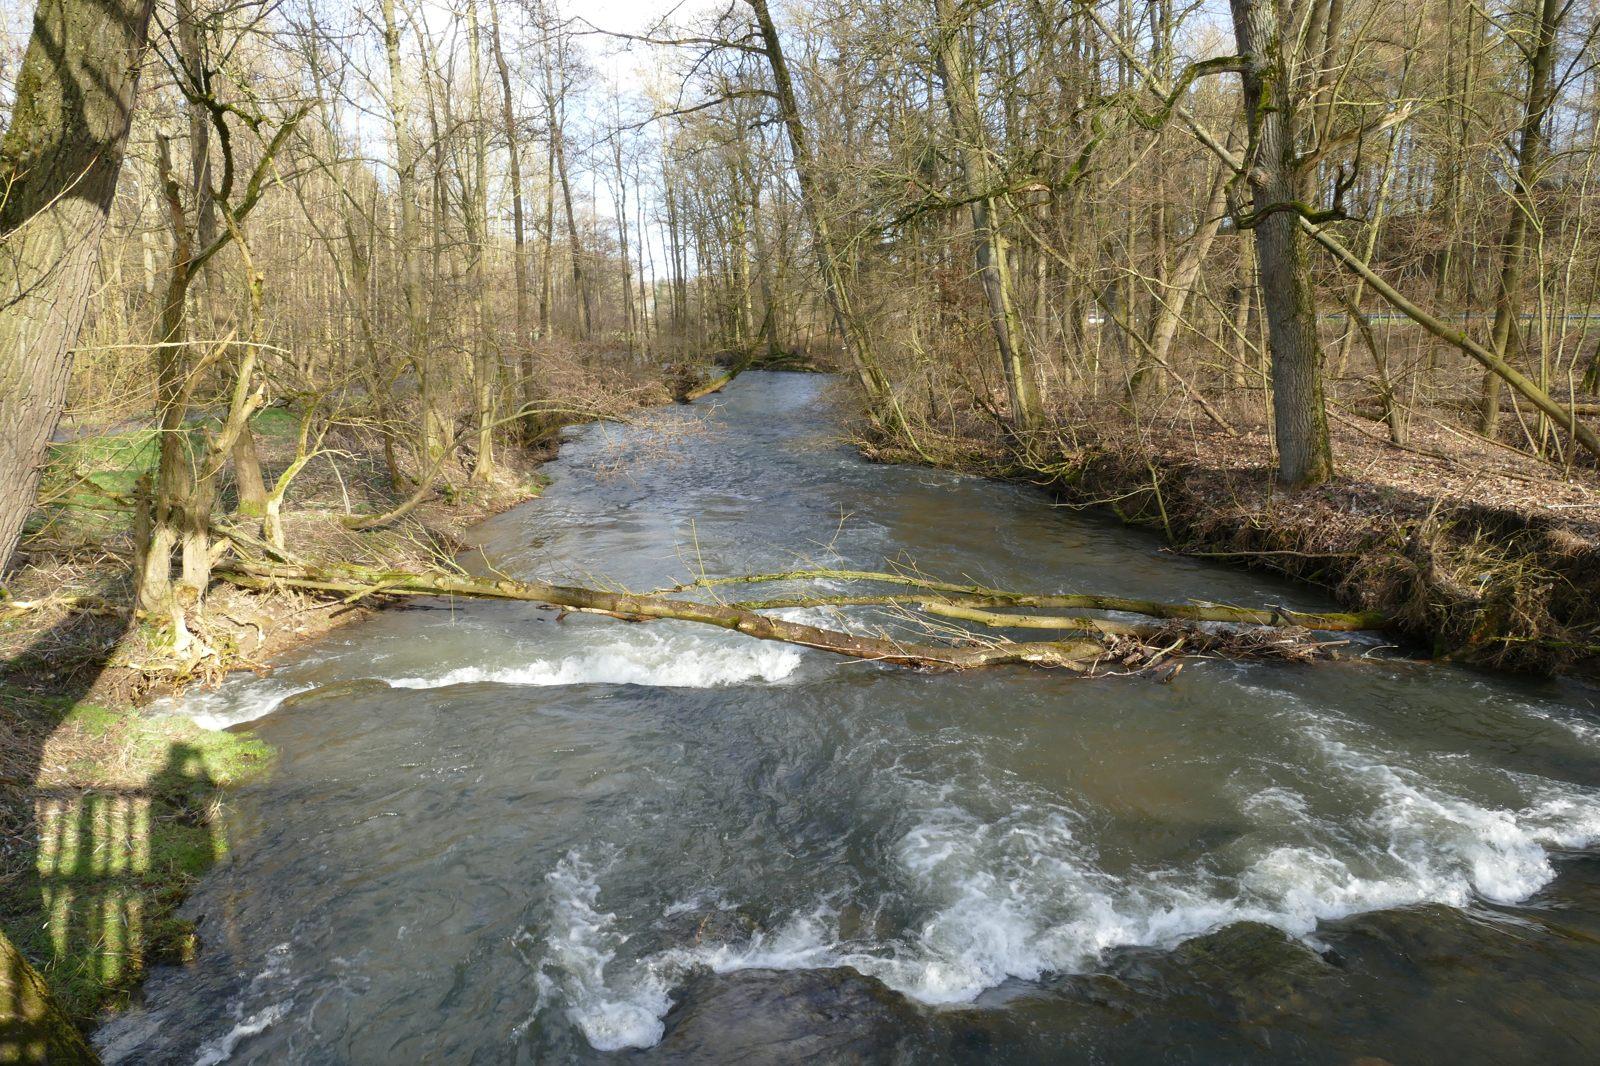 Dieses Wasser fließt Richtung Ärmelkanal